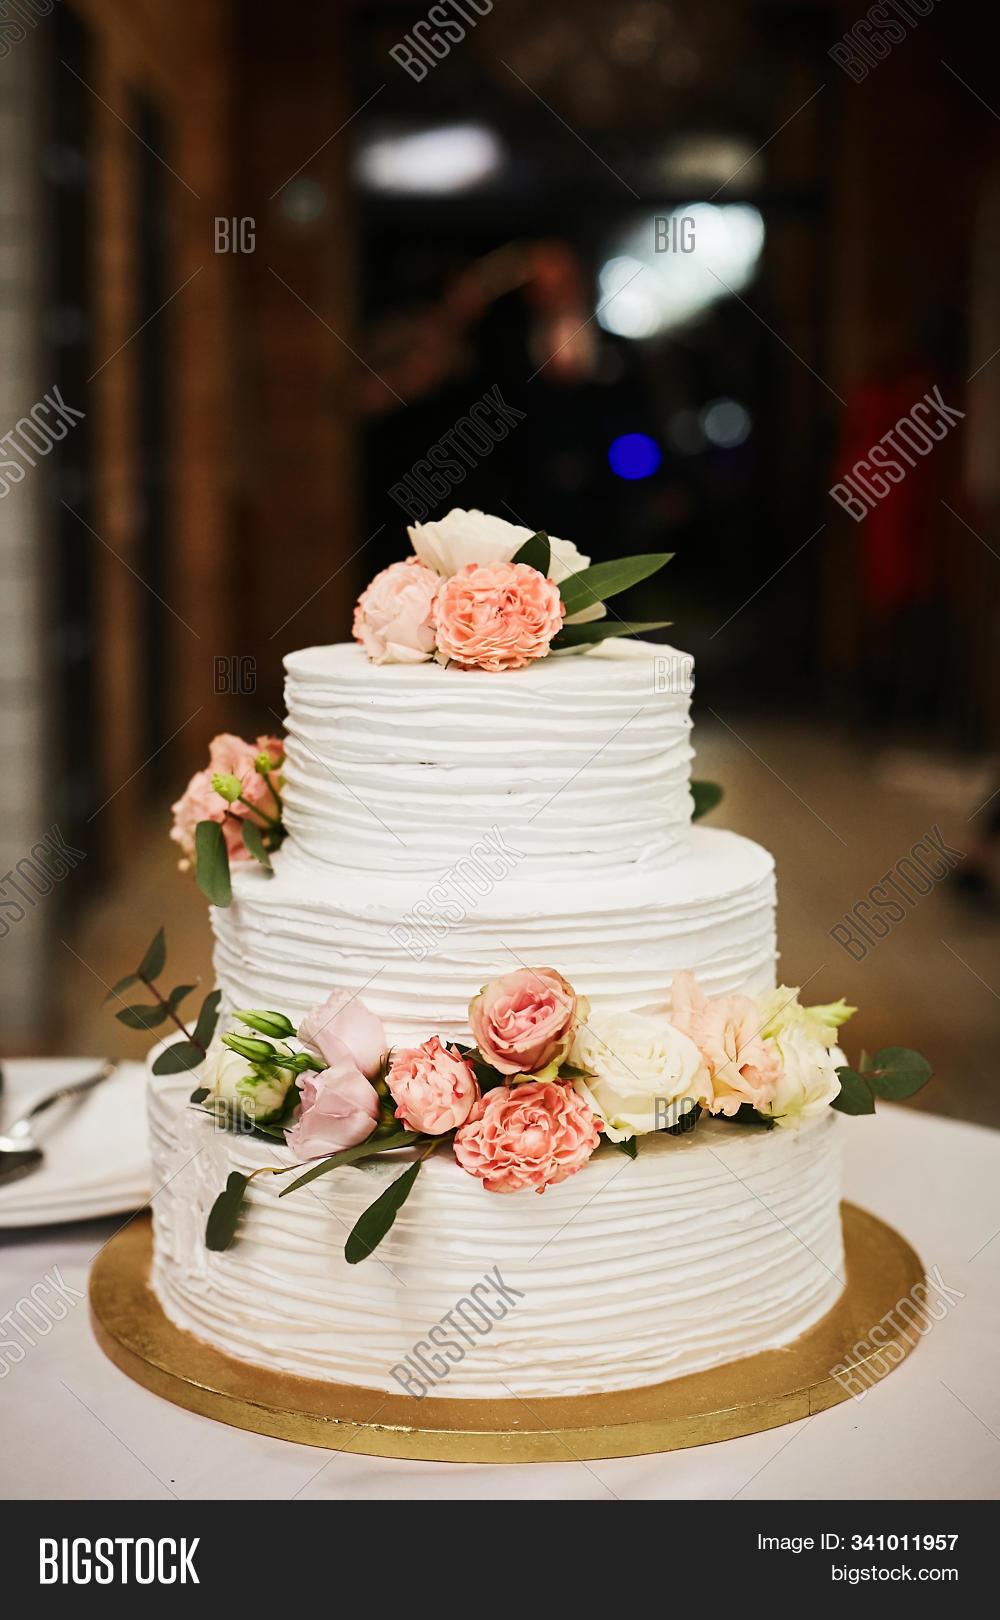 Outstanding White Wedding Cake Image Photo Free Trial Bigstock Funny Birthday Cards Online Inifodamsfinfo